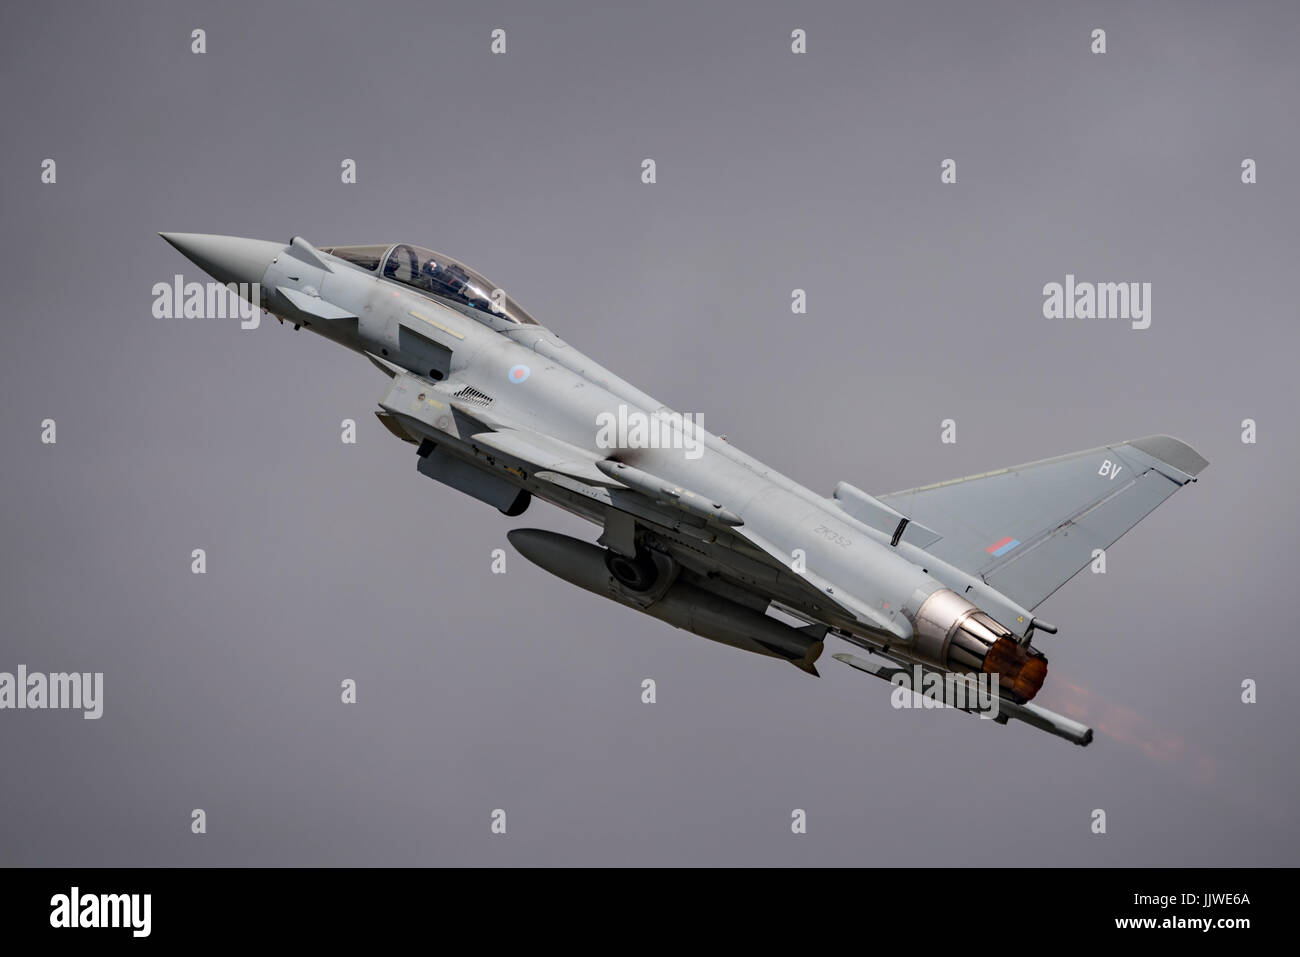 RAF Typhoon FGR4 display at RIAT 2017. - Stock Image